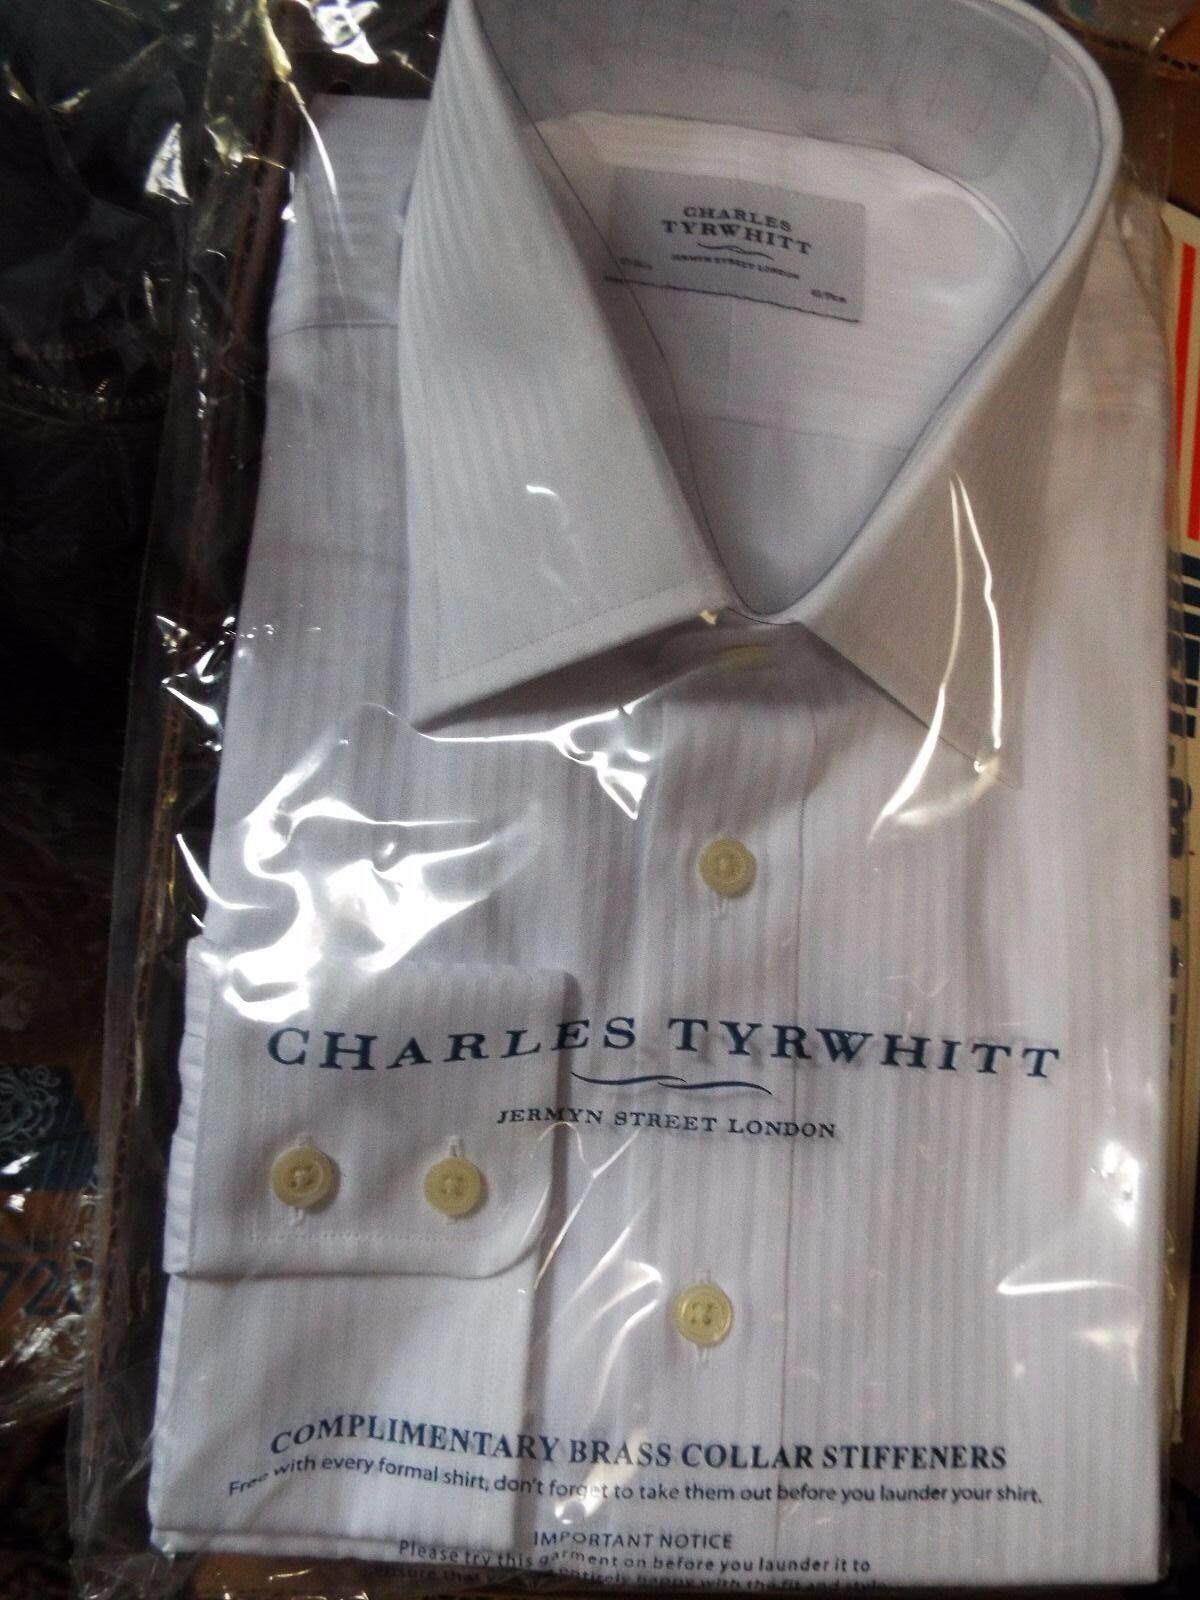 NWTCHARLES TYRWHITT Weiß on Weiß Satin Stripe 17-36 Classic Fit, Button Cuff